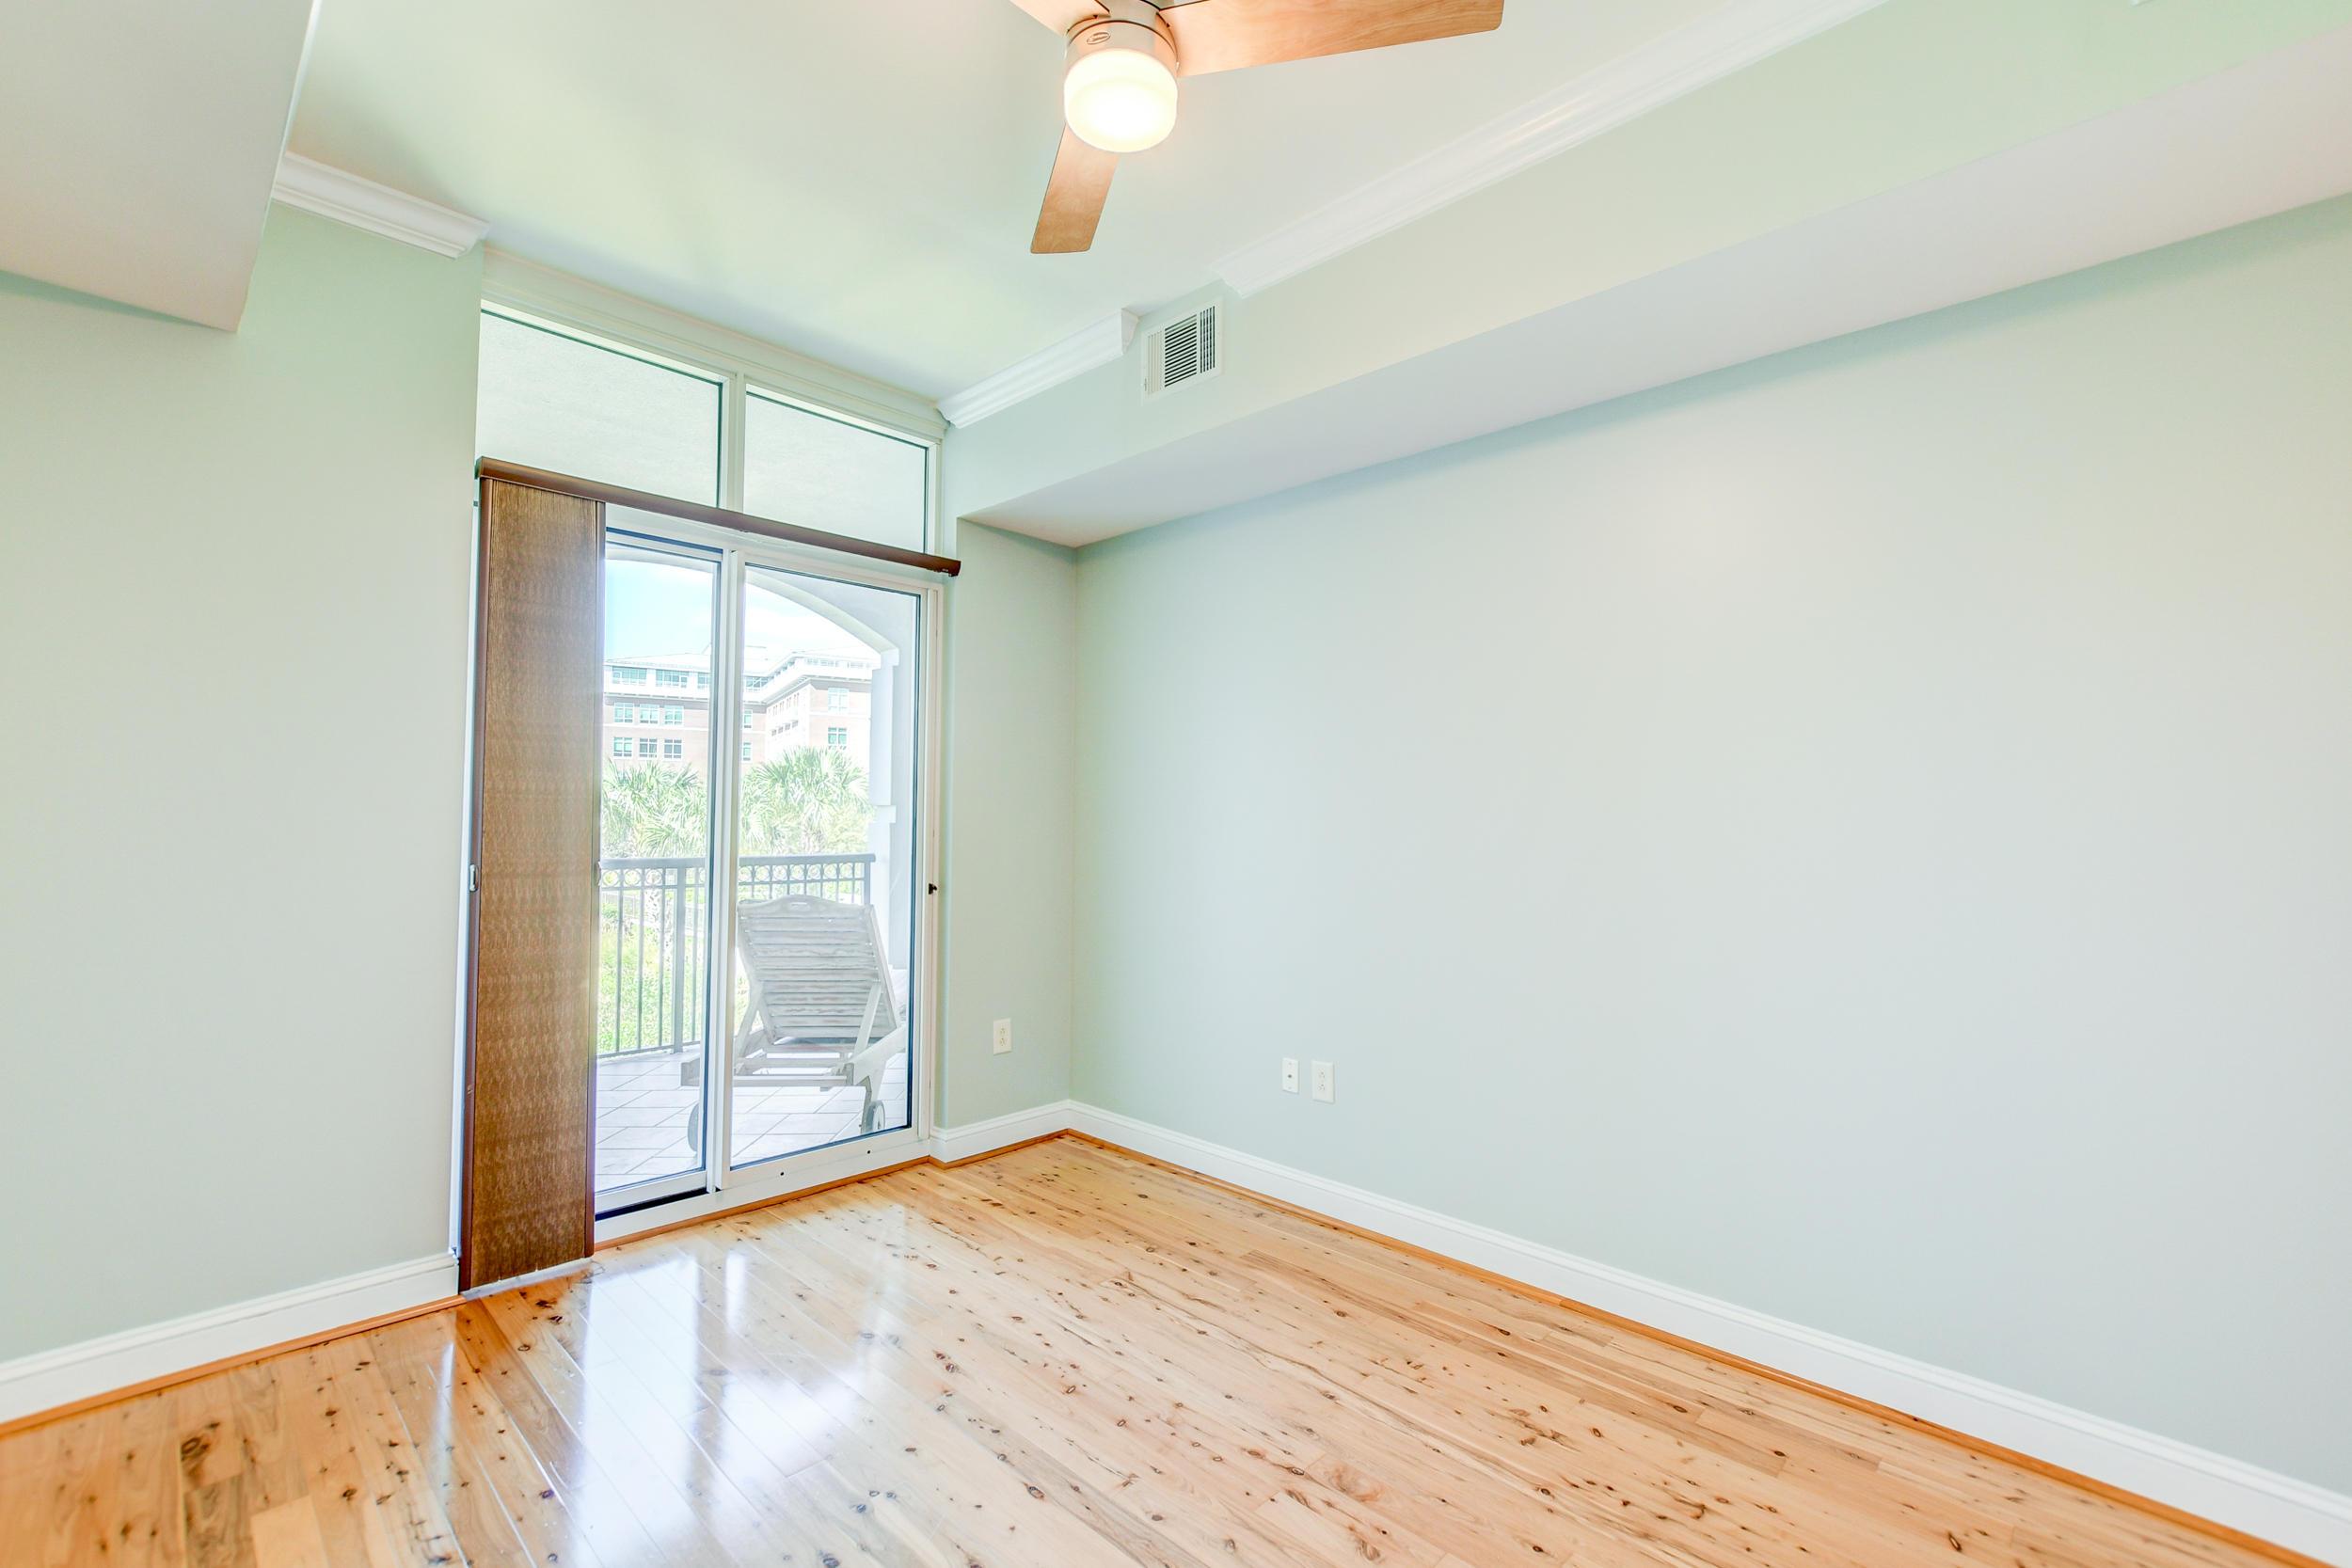 Renaissance On Chas Harbor Homes For Sale - 224 Plaza, Mount Pleasant, SC - 22